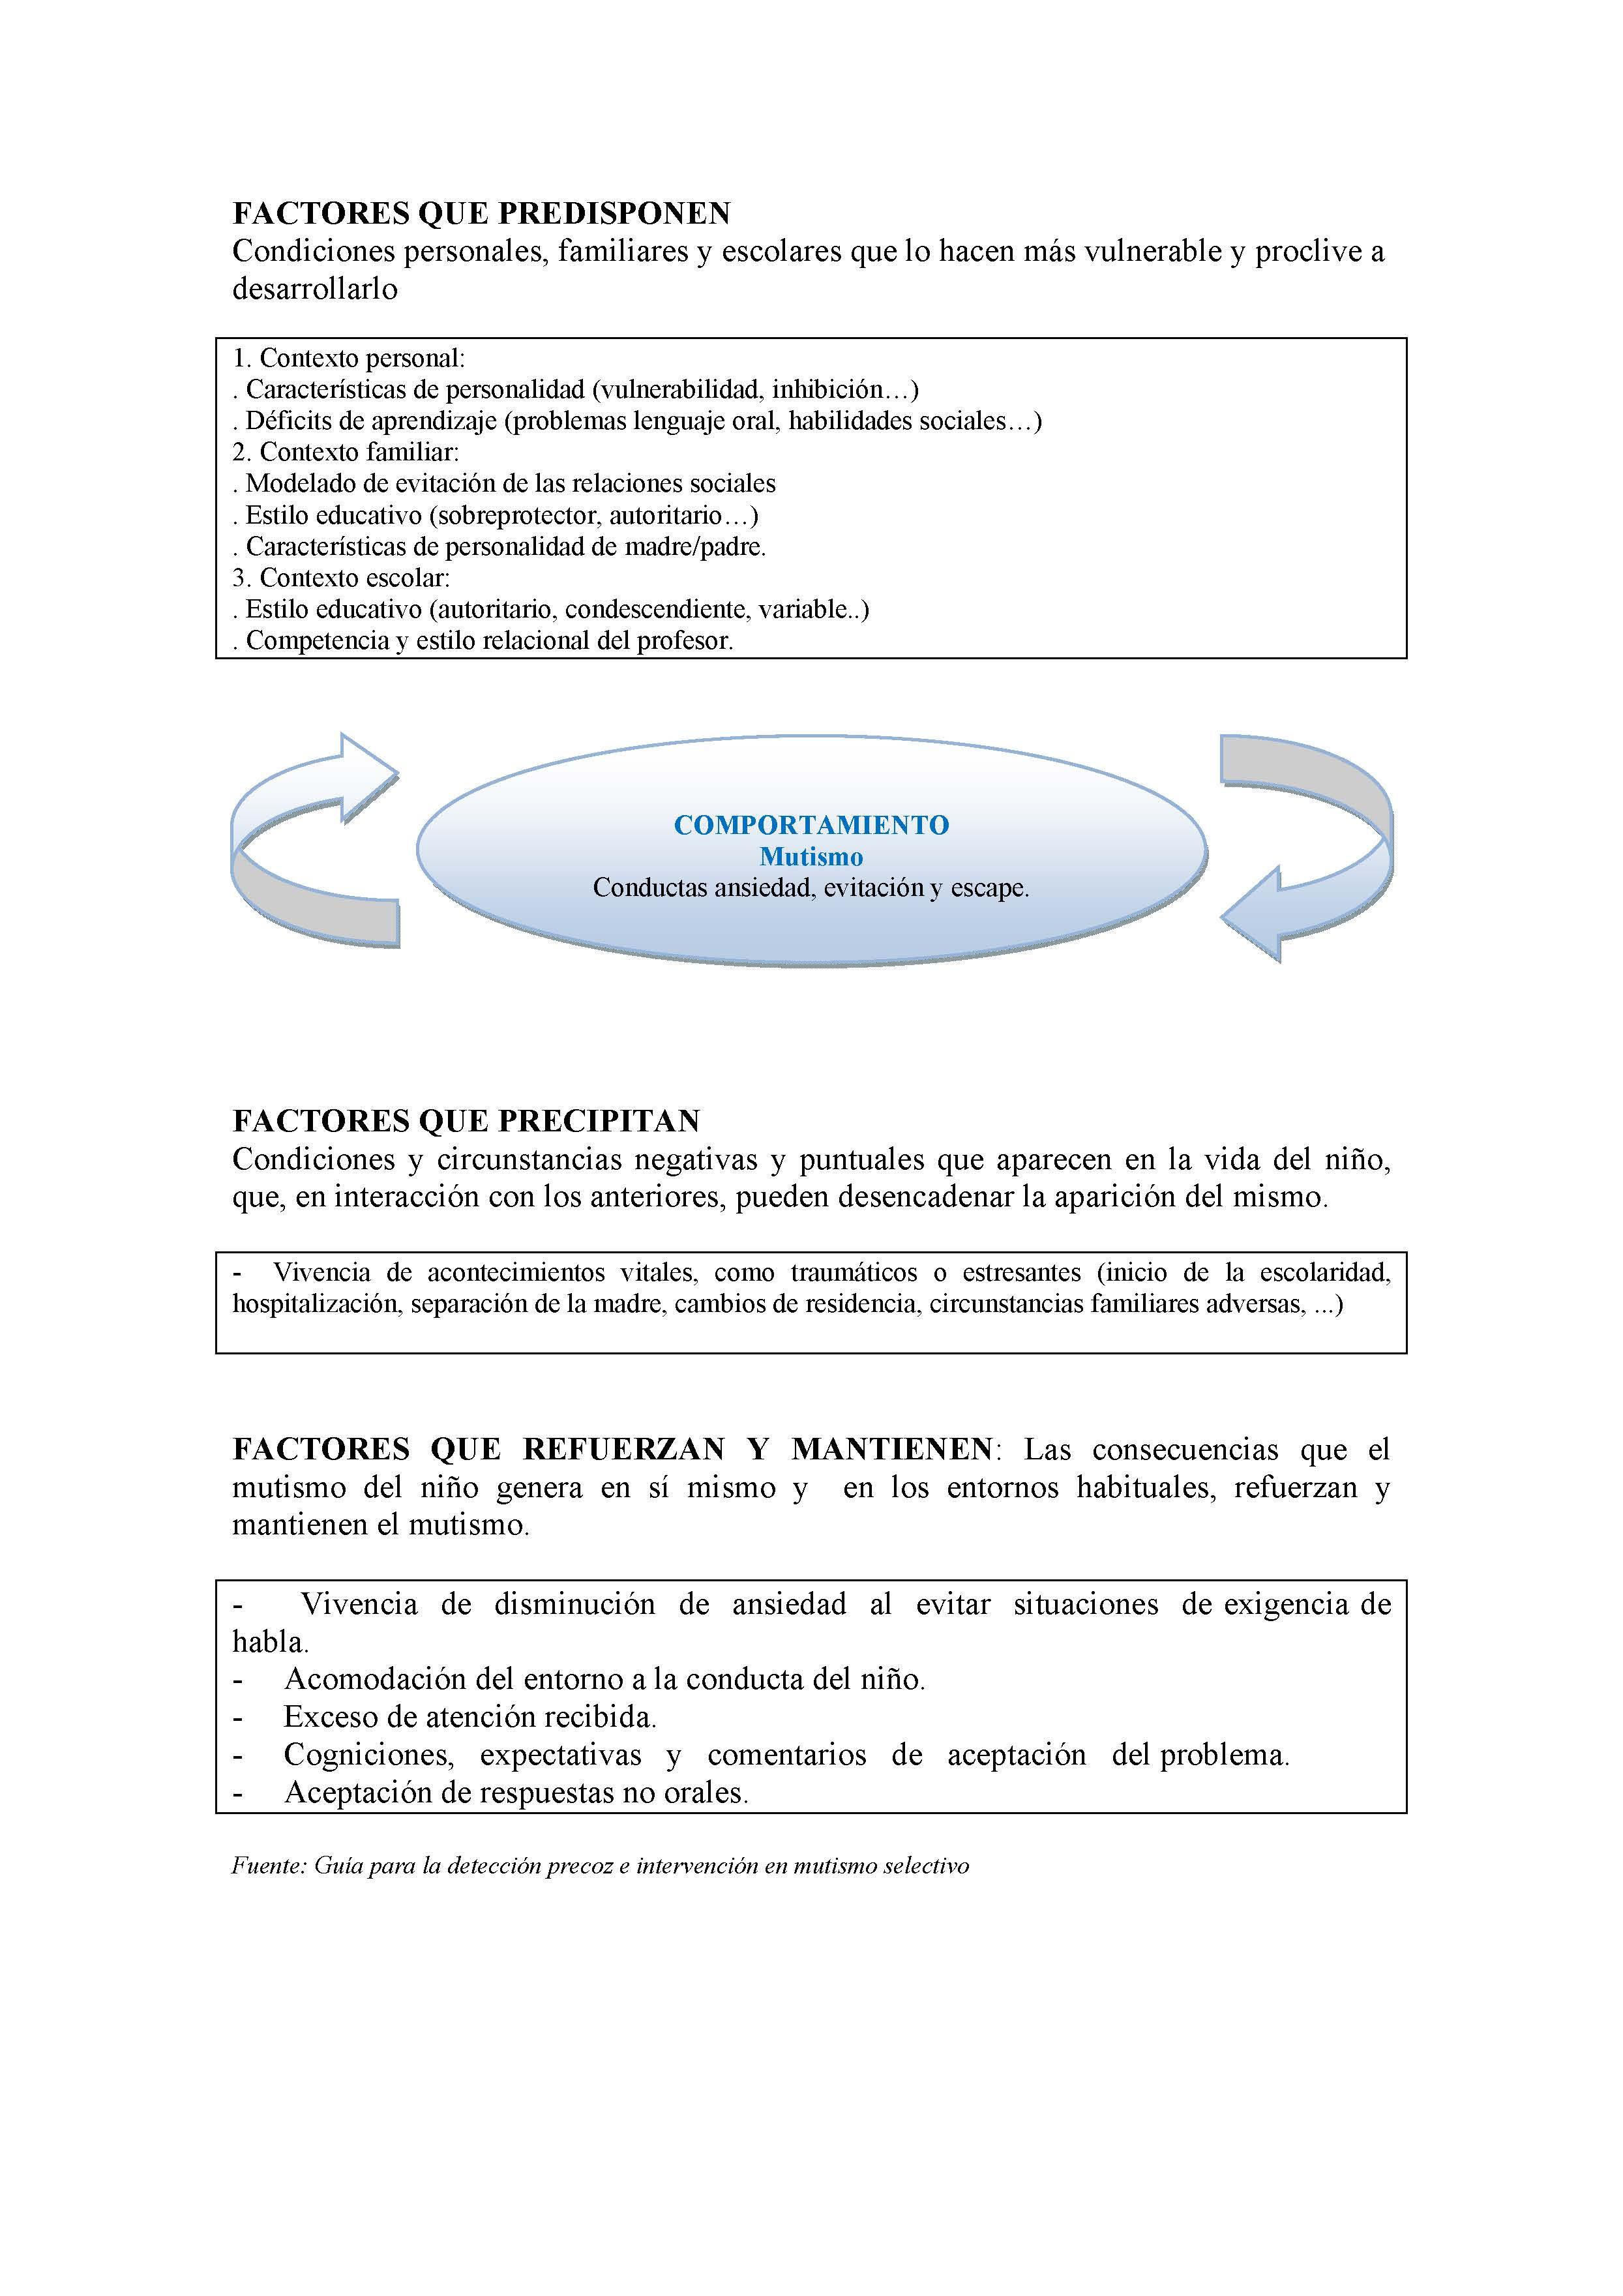 factores-que-predisponen